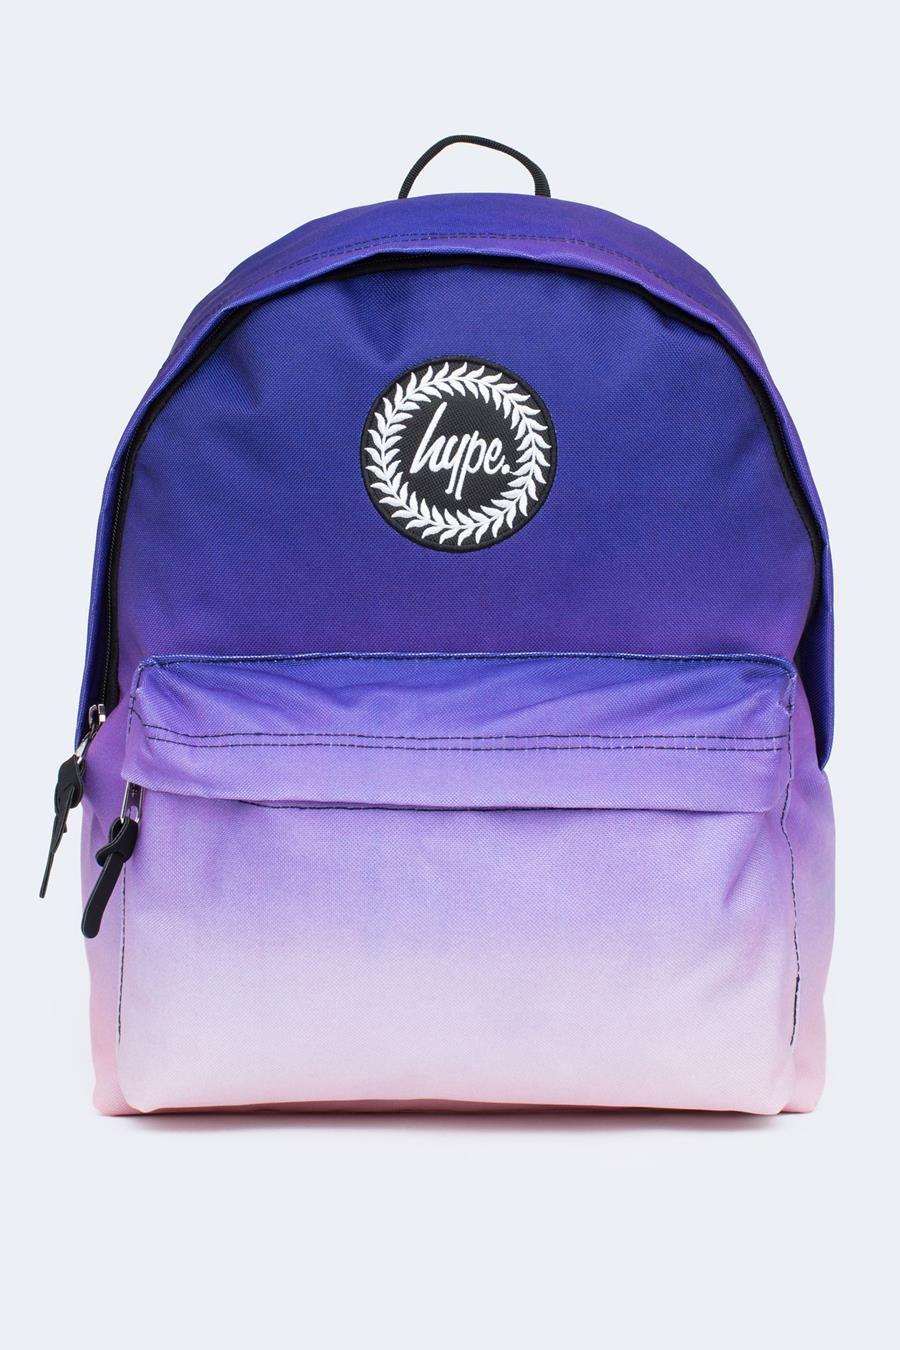 Hype Horizon Backpack Hype Bags Bags Girls Bags